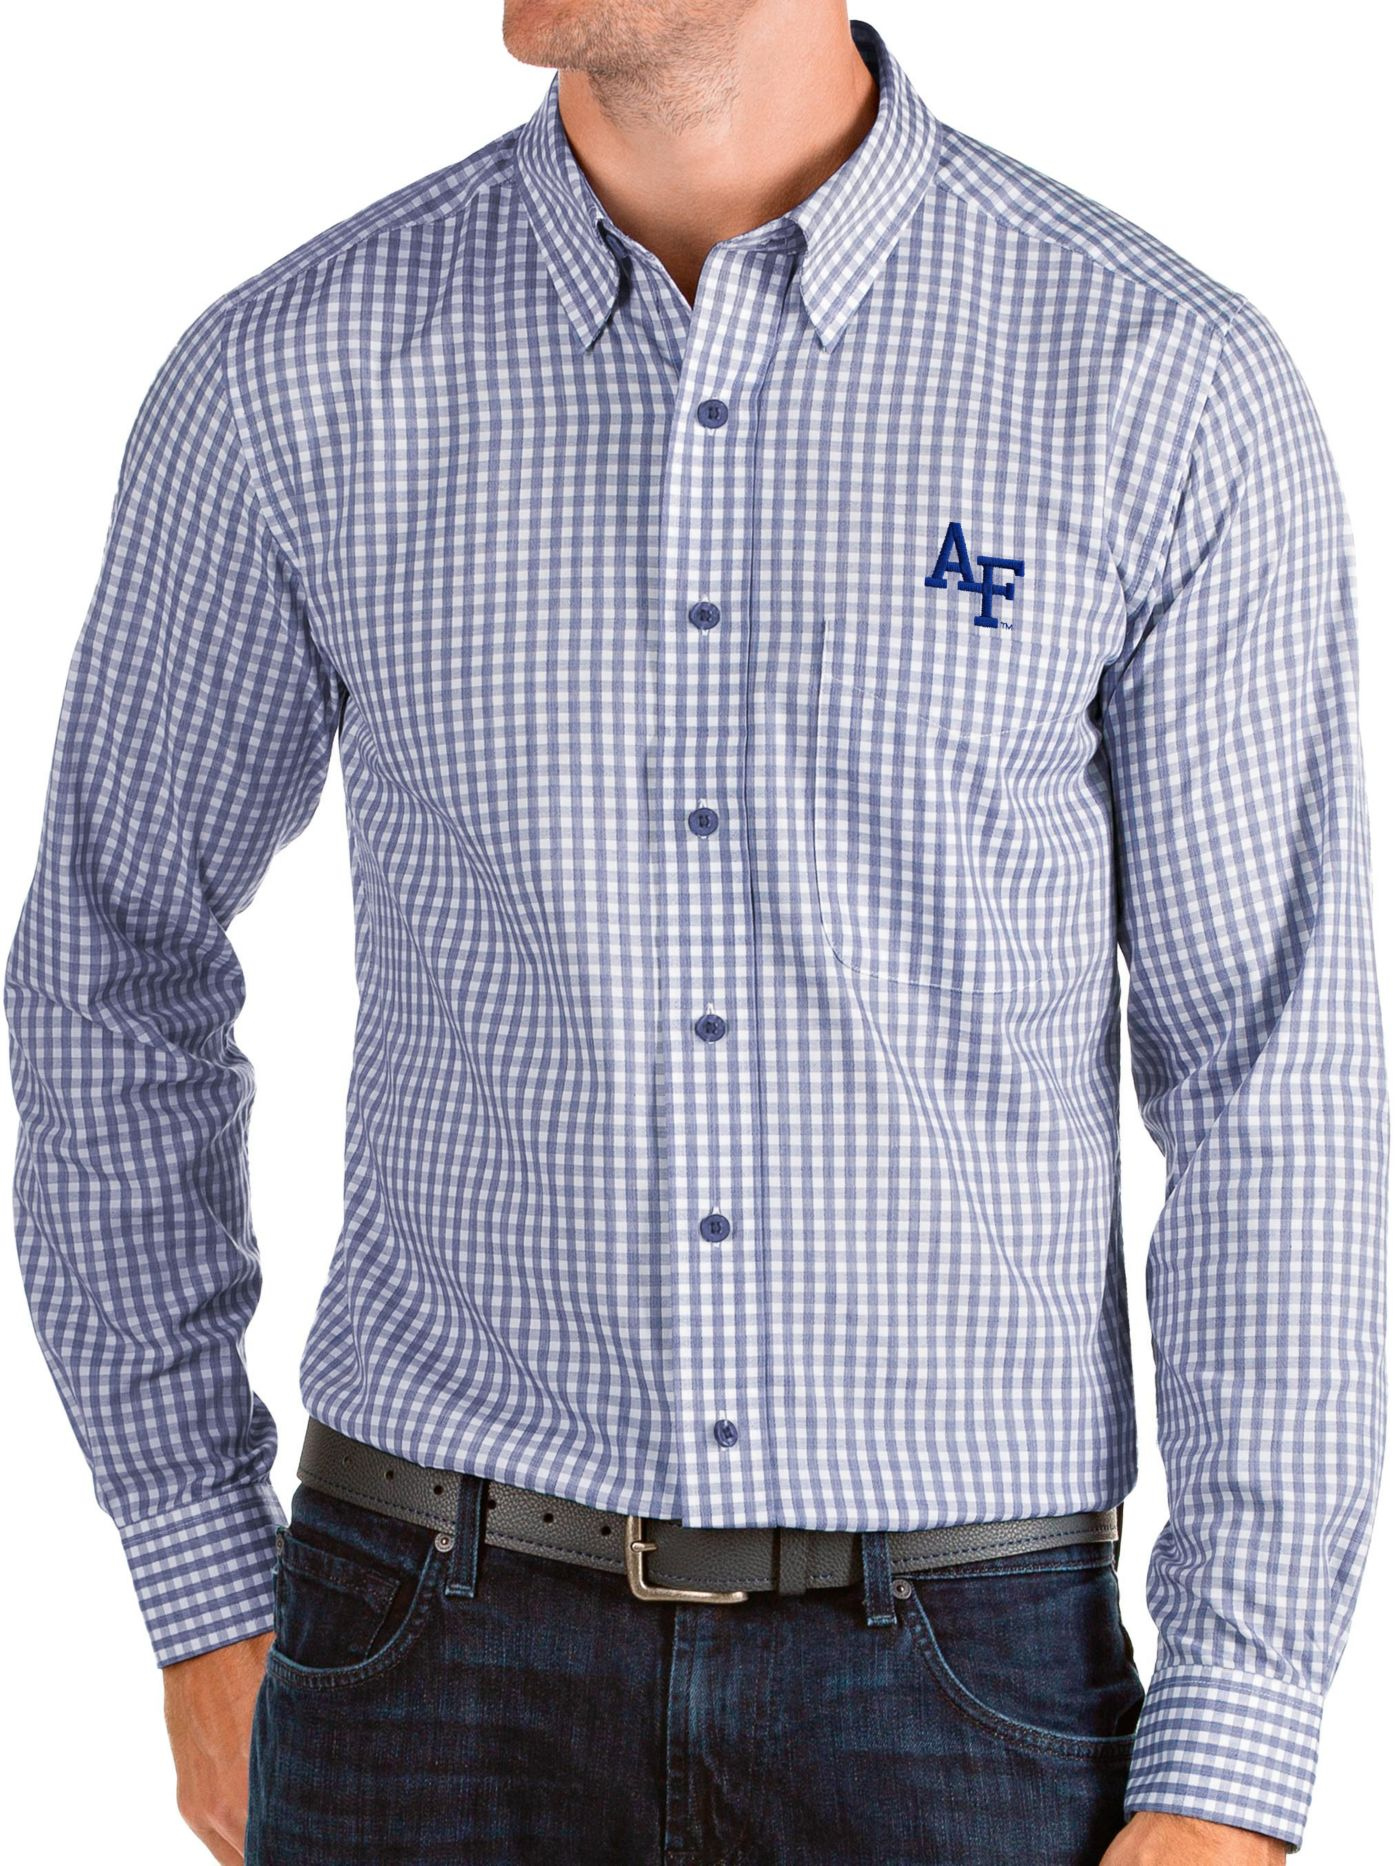 Antigua Men's Air Force Falcons Blue Structure Button Down Long Sleeve Shirt